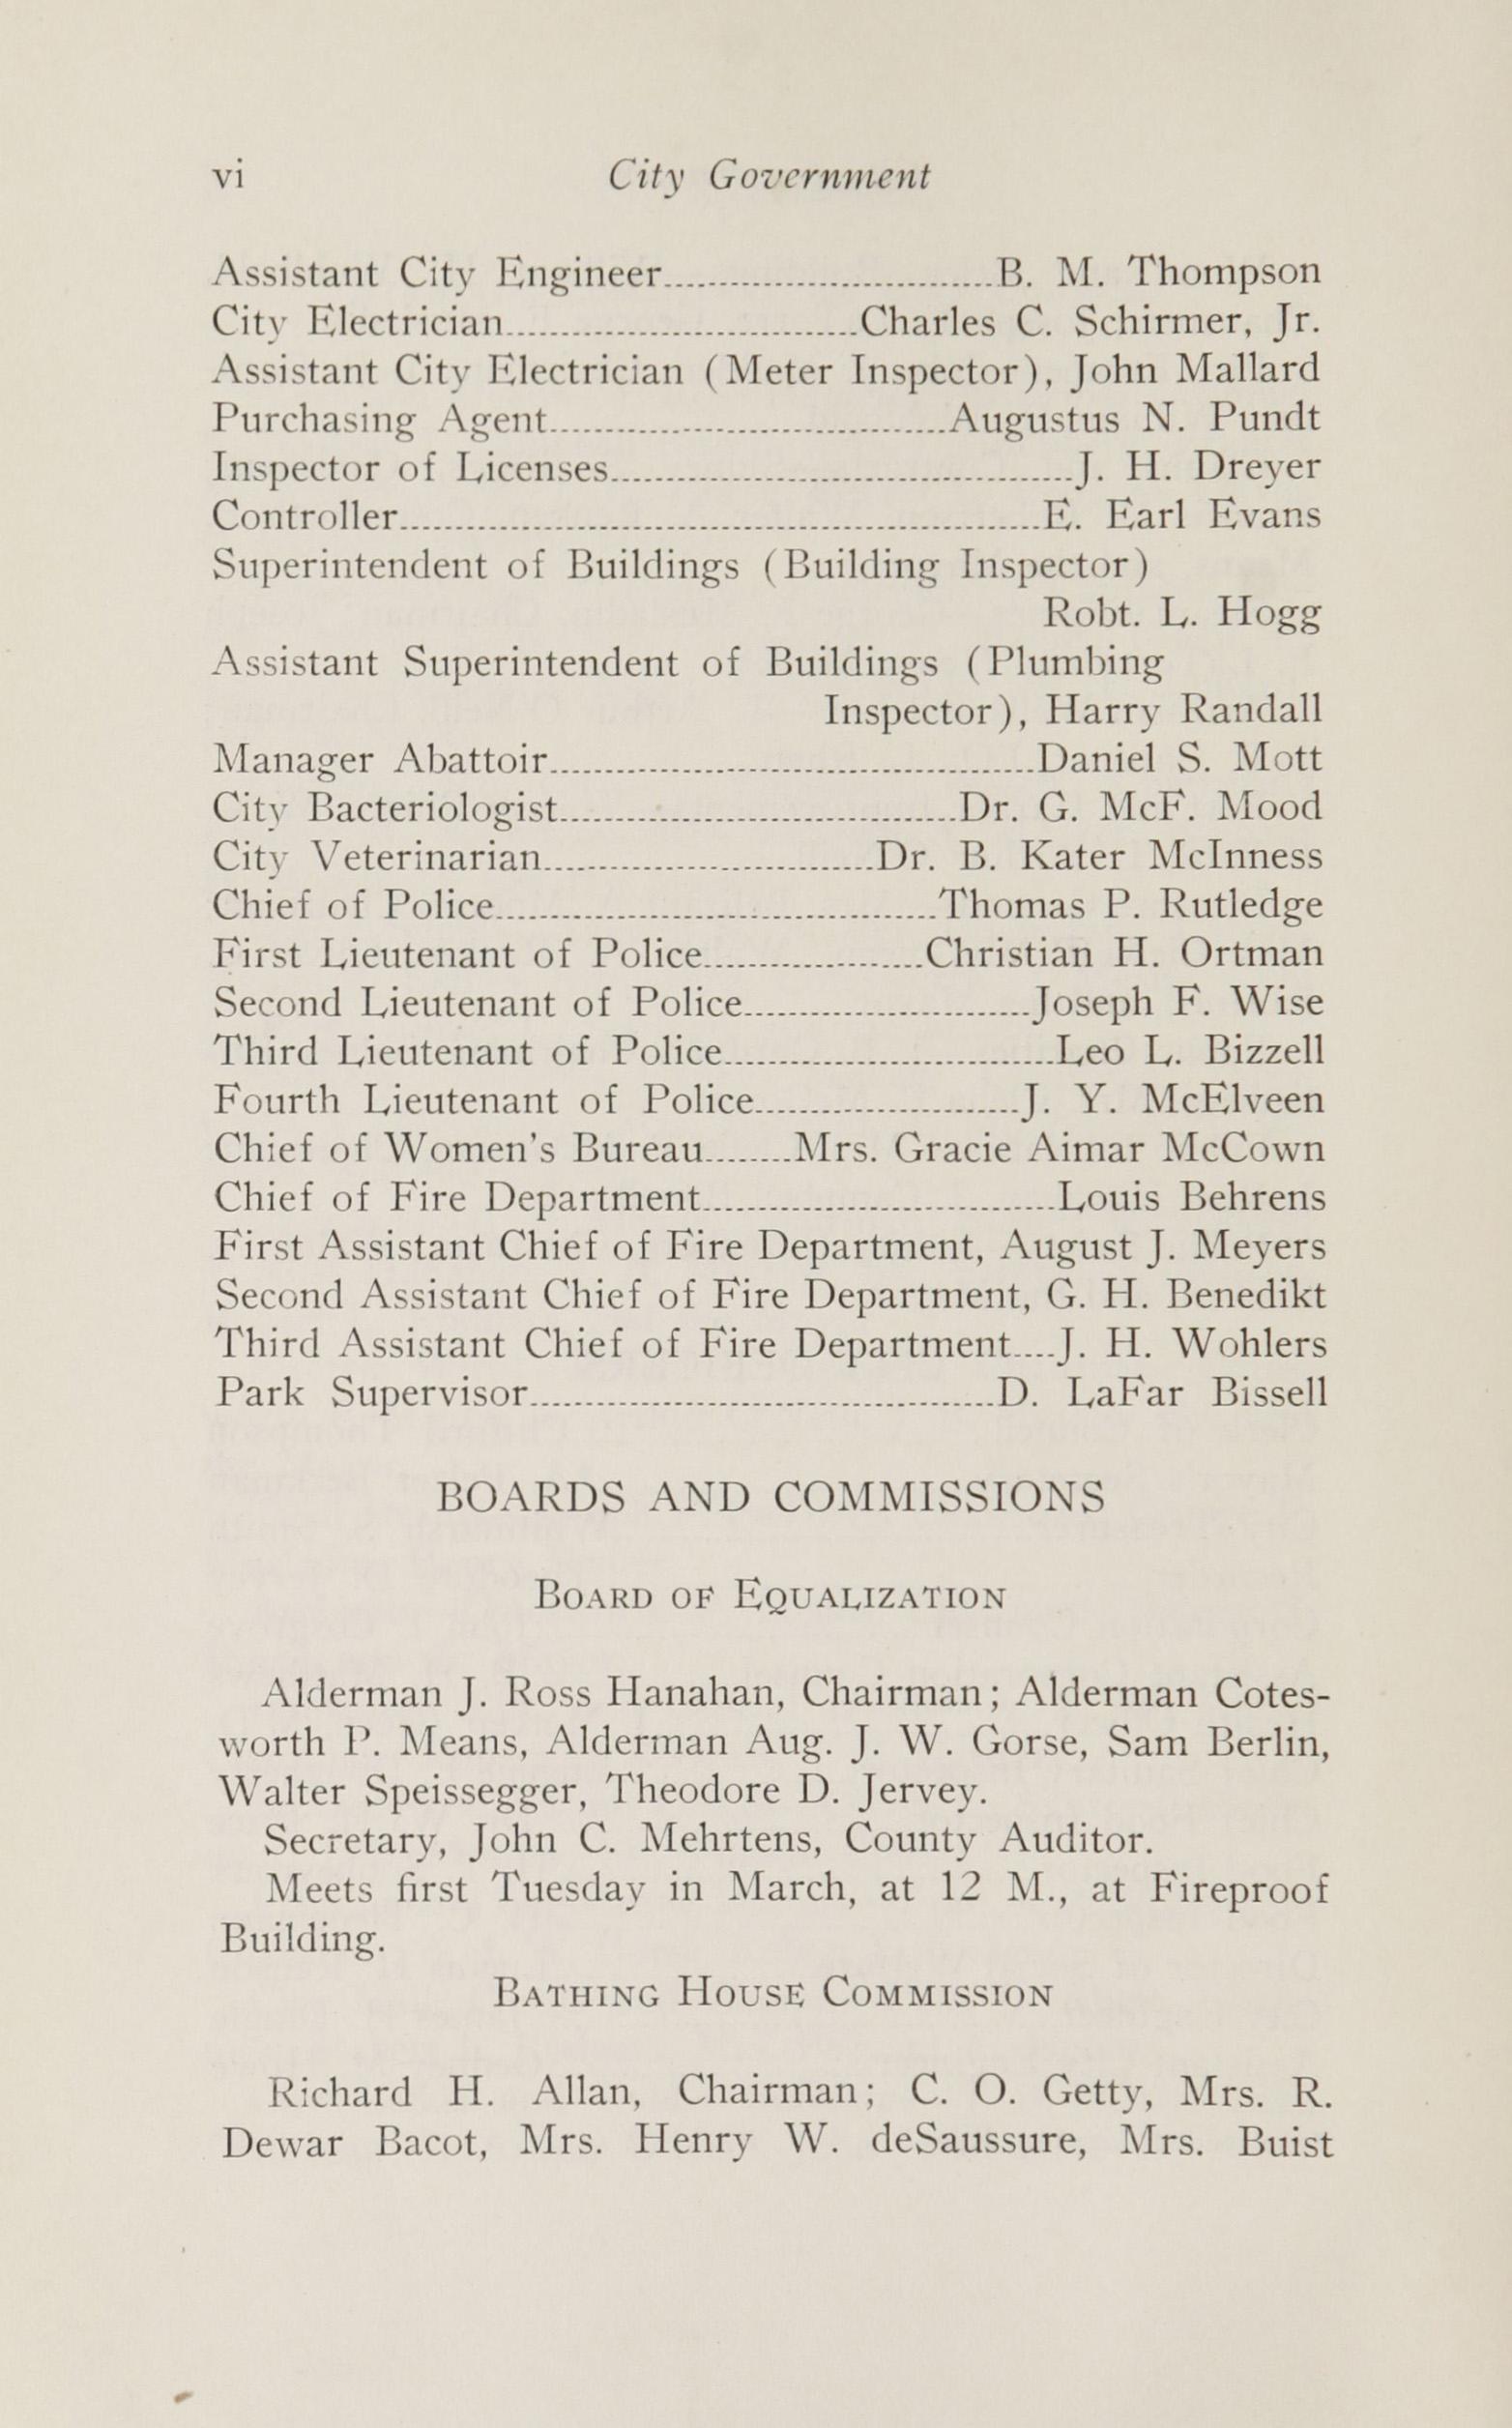 Charleston Yearbook, 1924, page vi